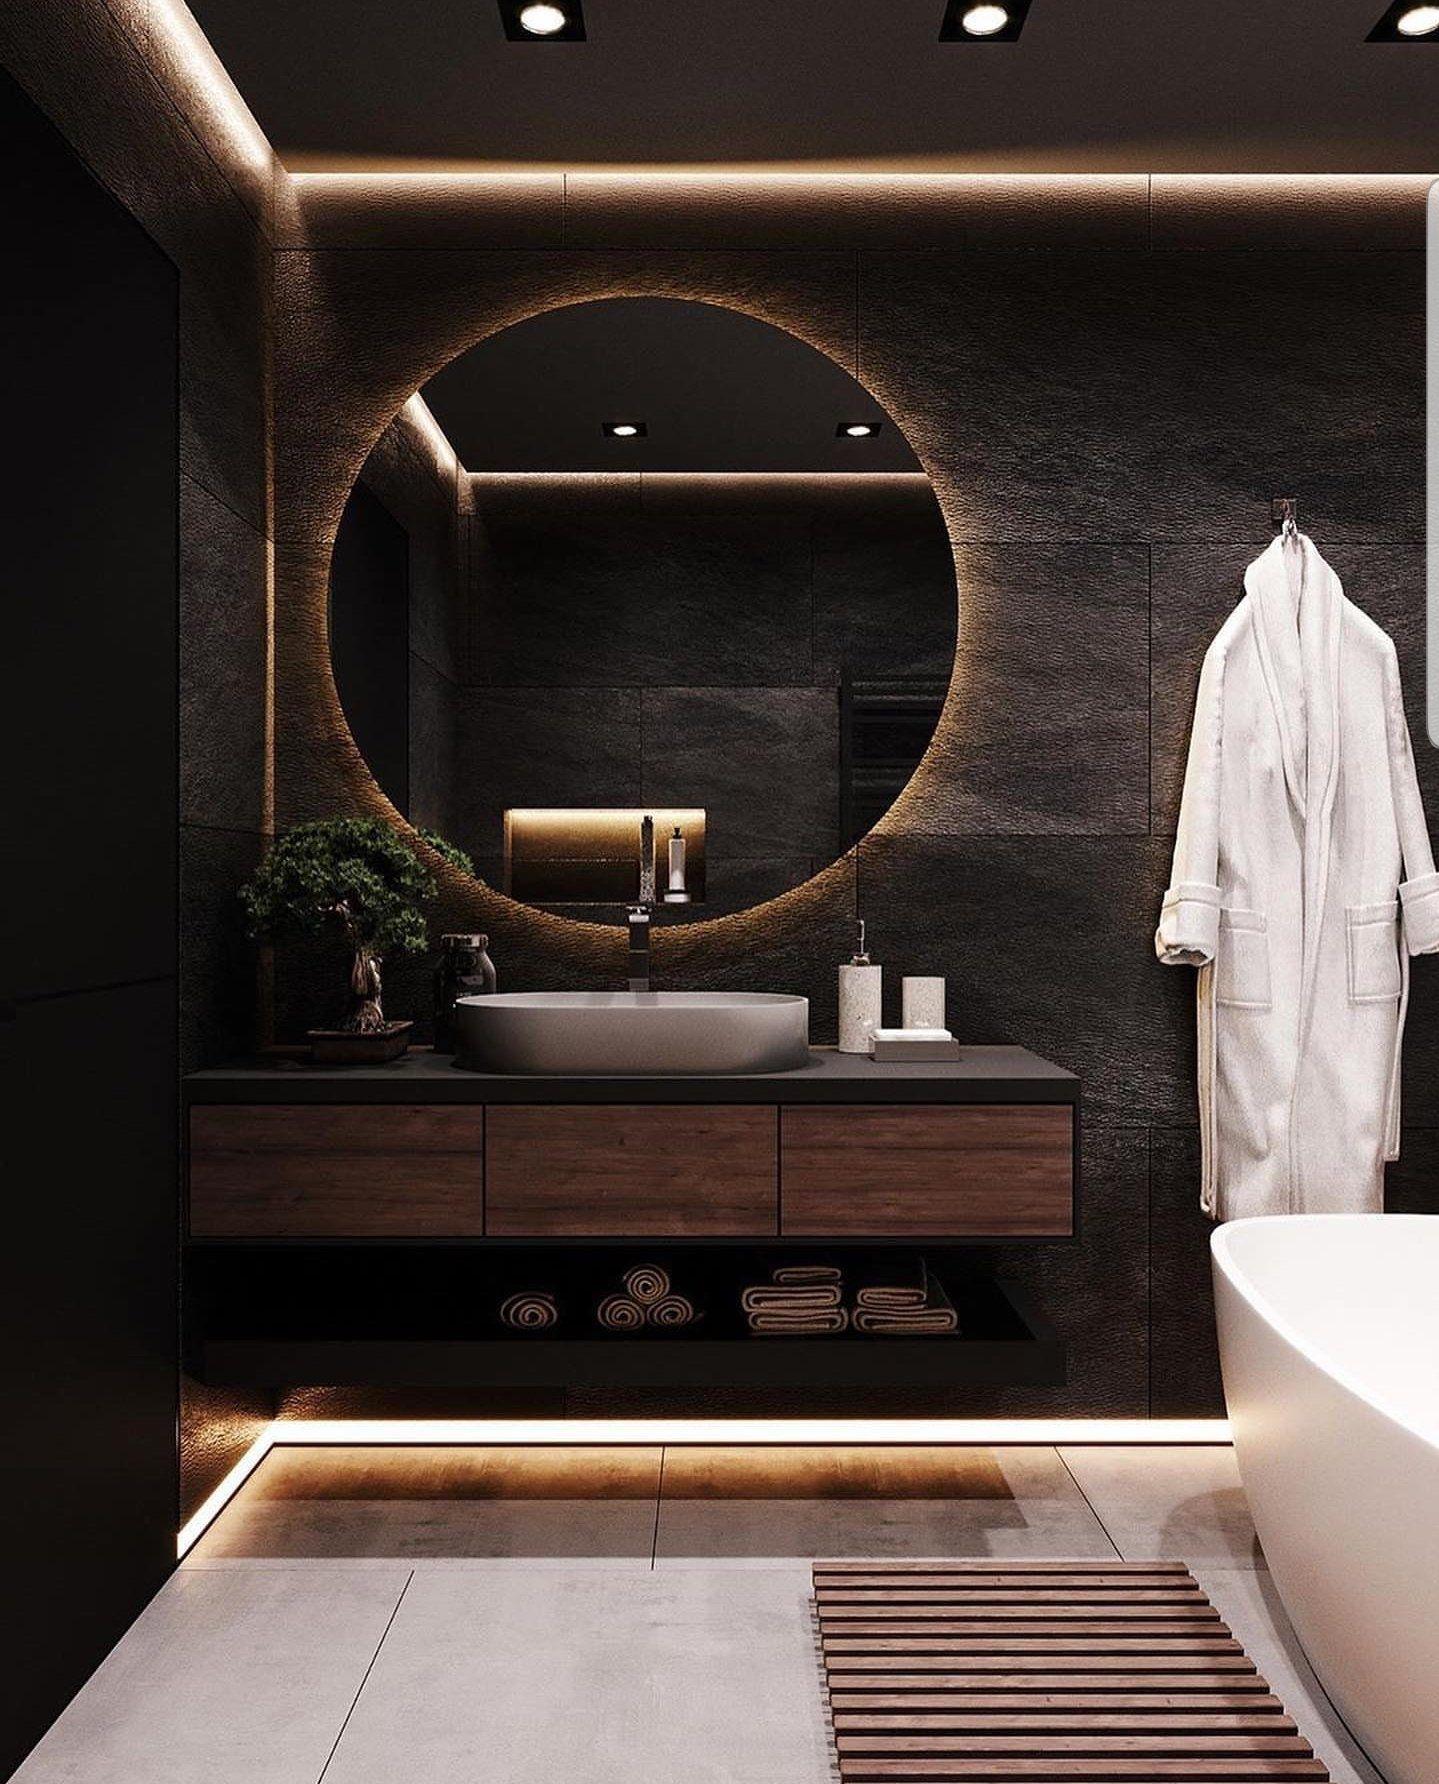 Pin By Virginie Letrentequatre On Home In 2020 Bathroom Design Luxury Bathroom Mirror Design Modern Luxury Bathroom